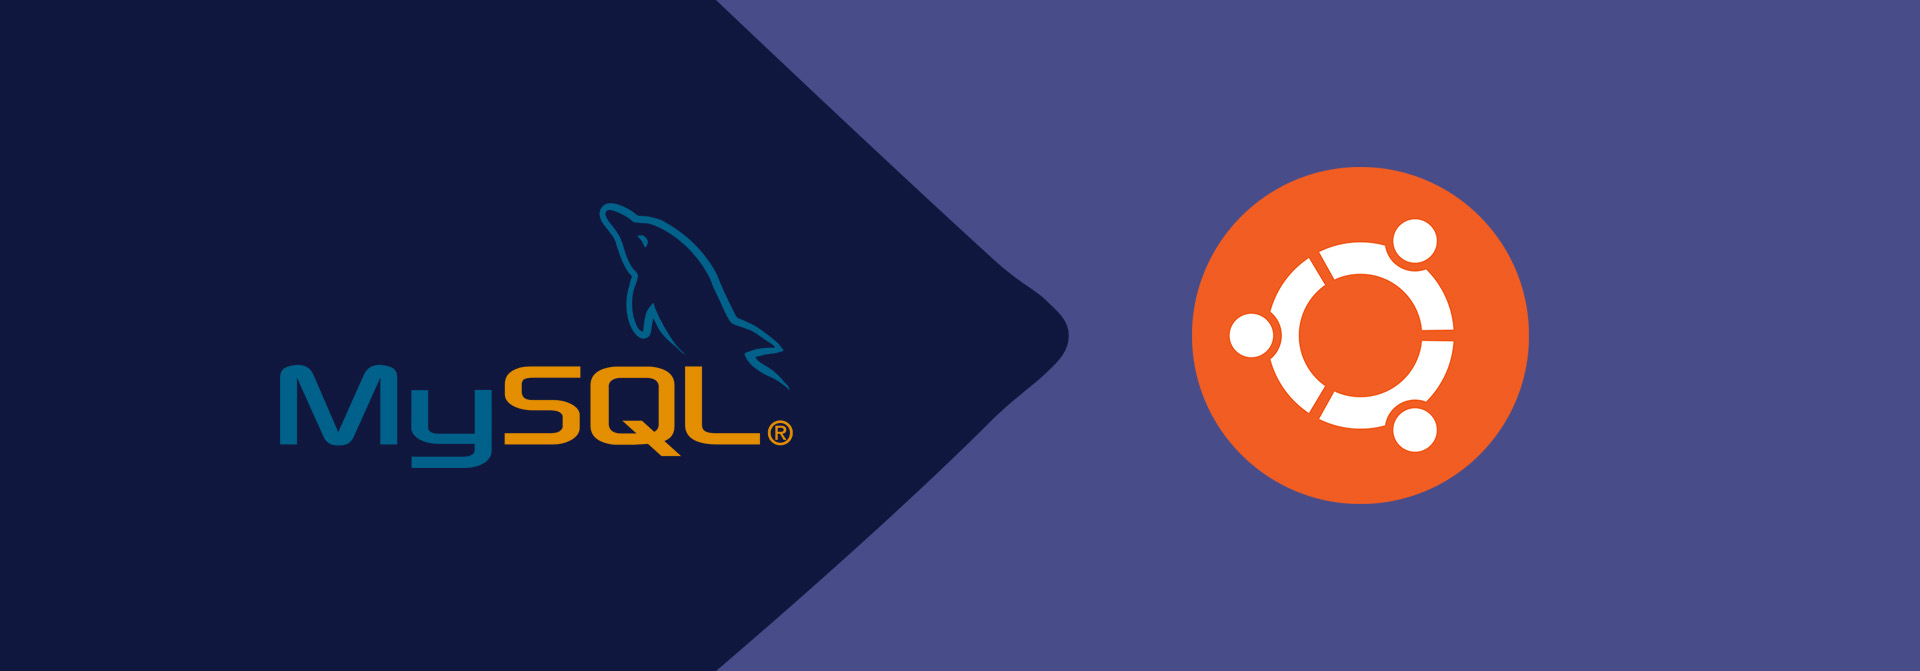 How To Install MySQL 8 on Ubuntu 20.04 LTS